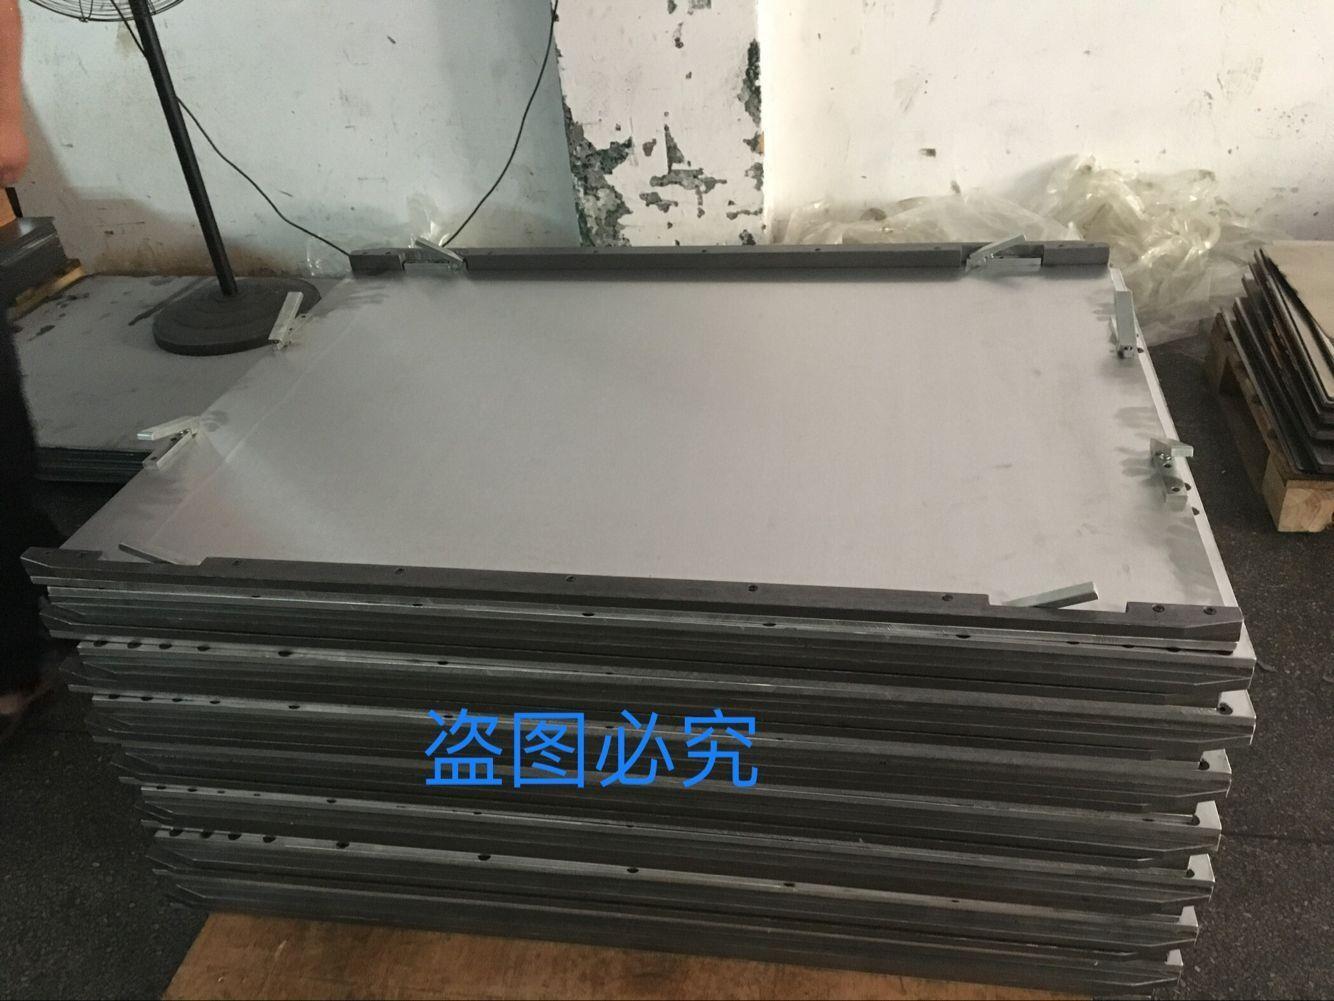 PCB线路板压机压合承载盘盖板托盘